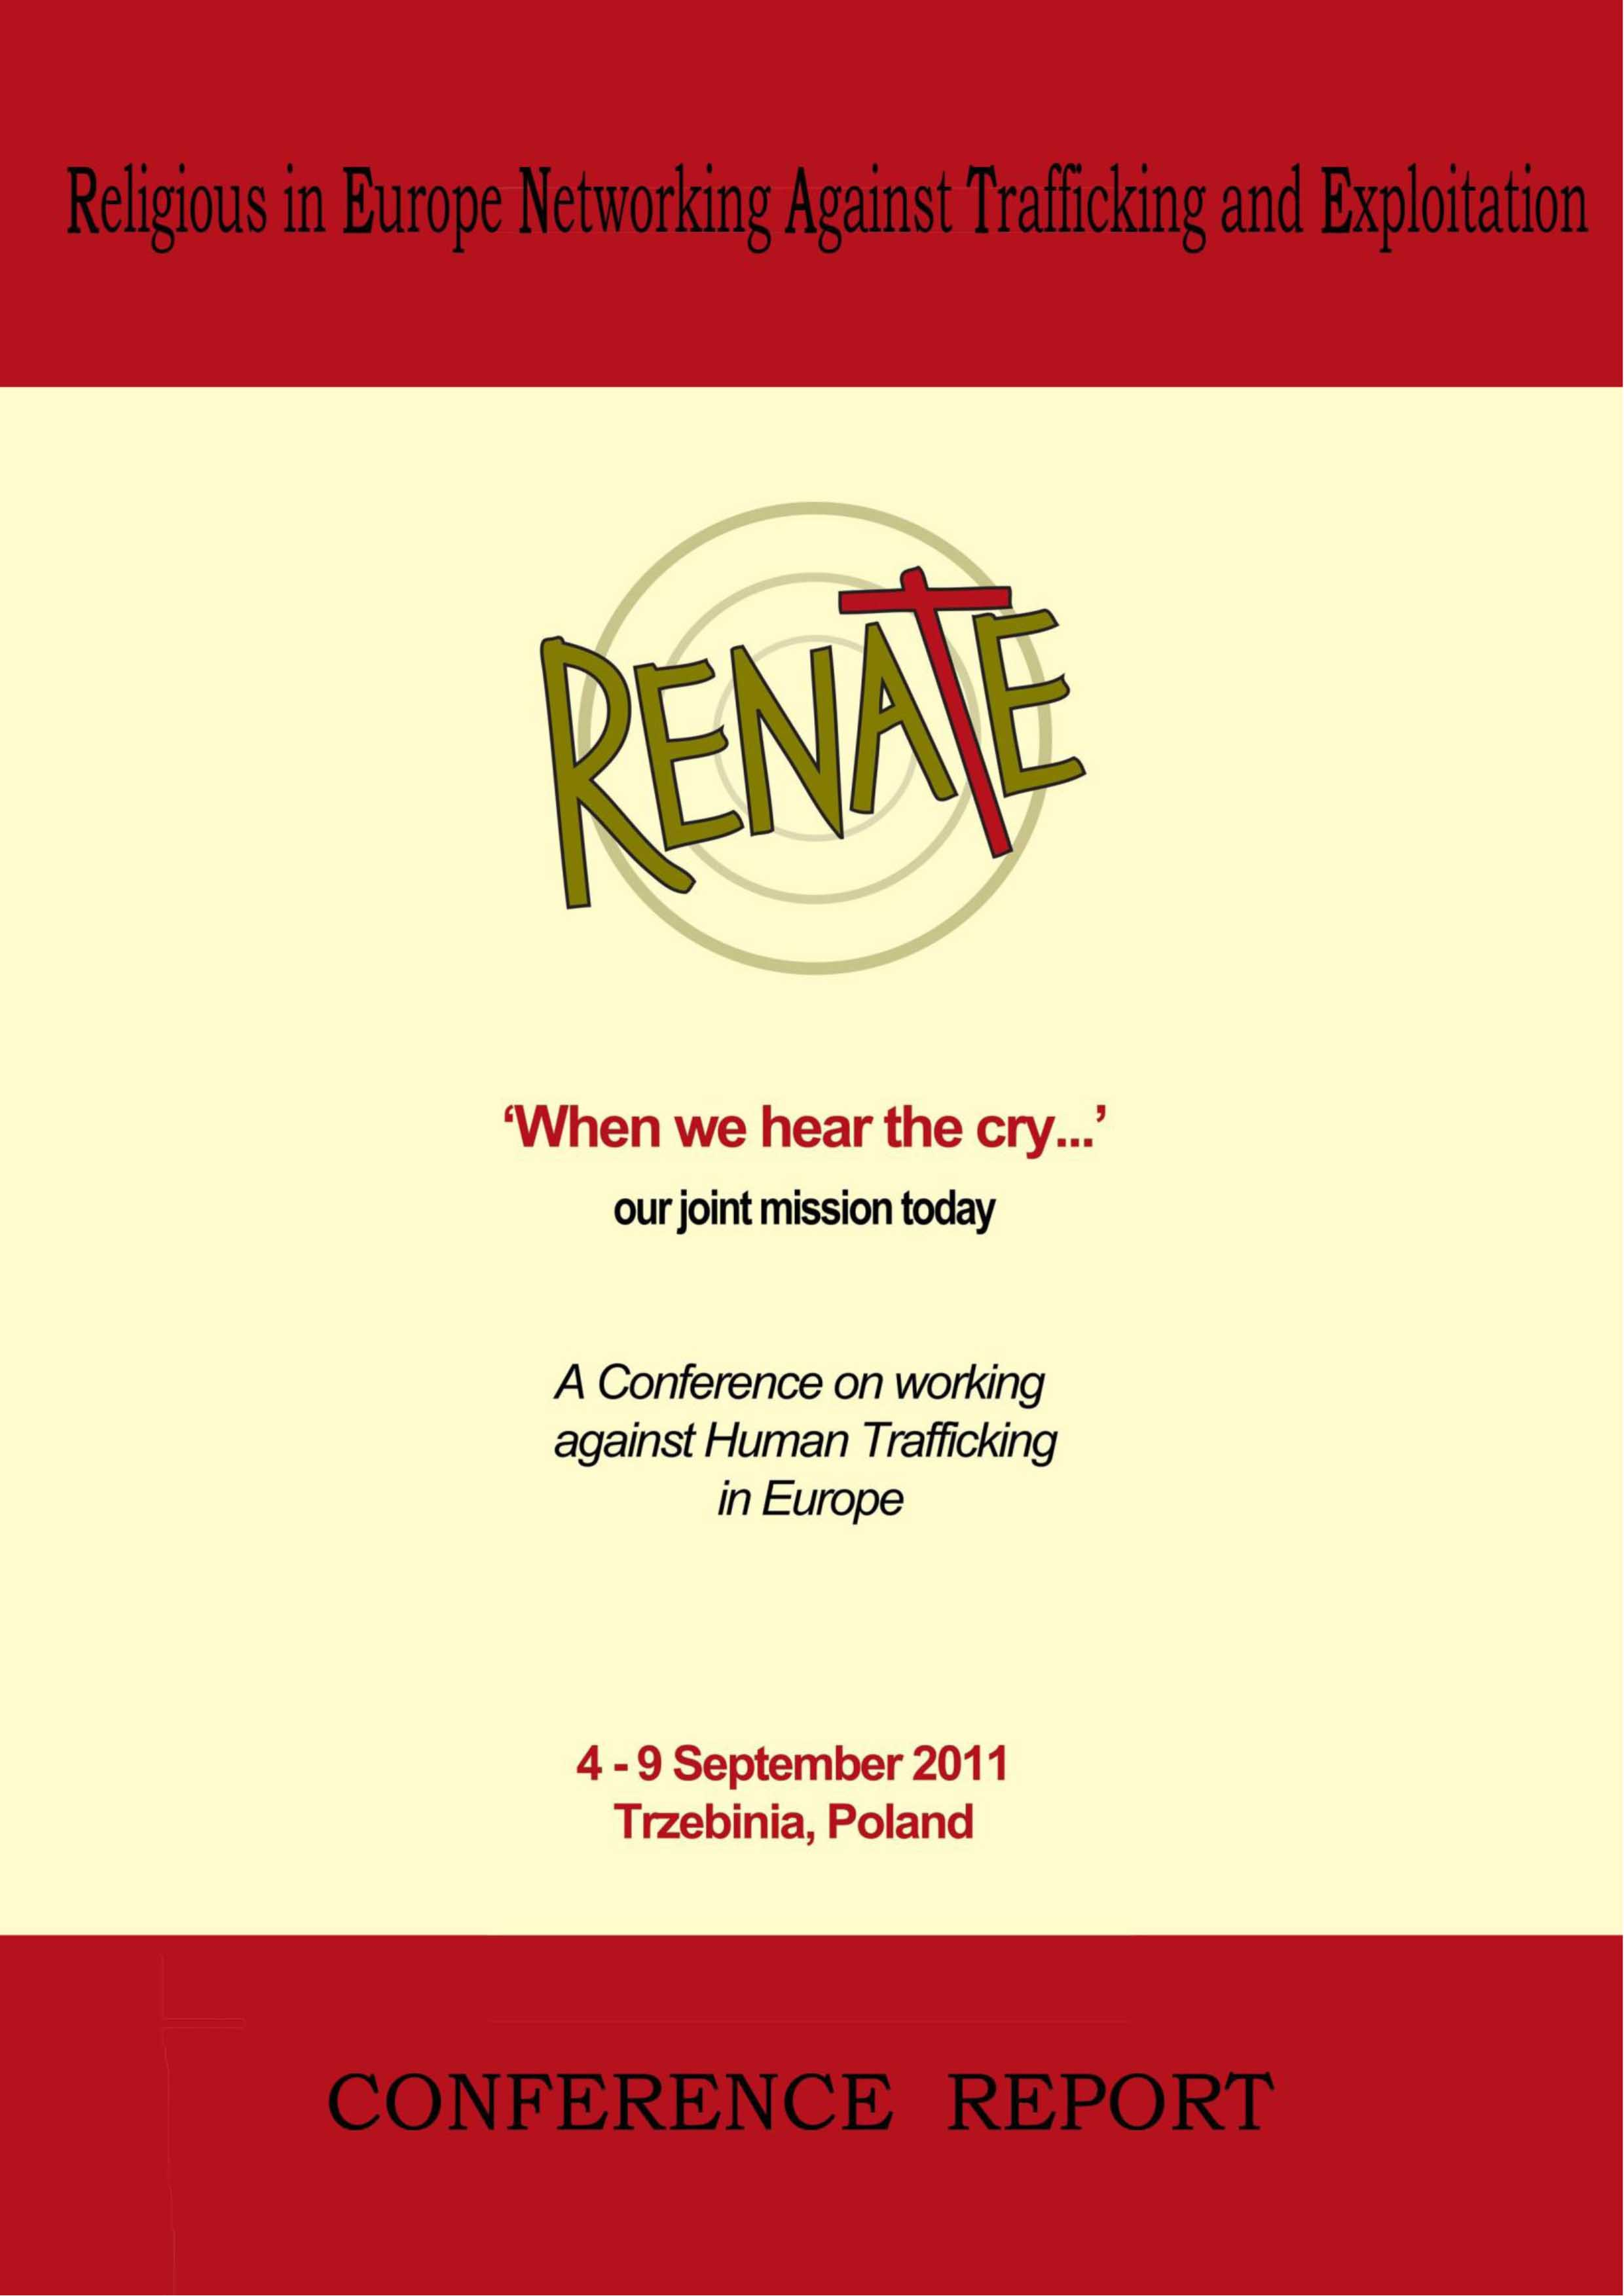 RENATE_conference_report